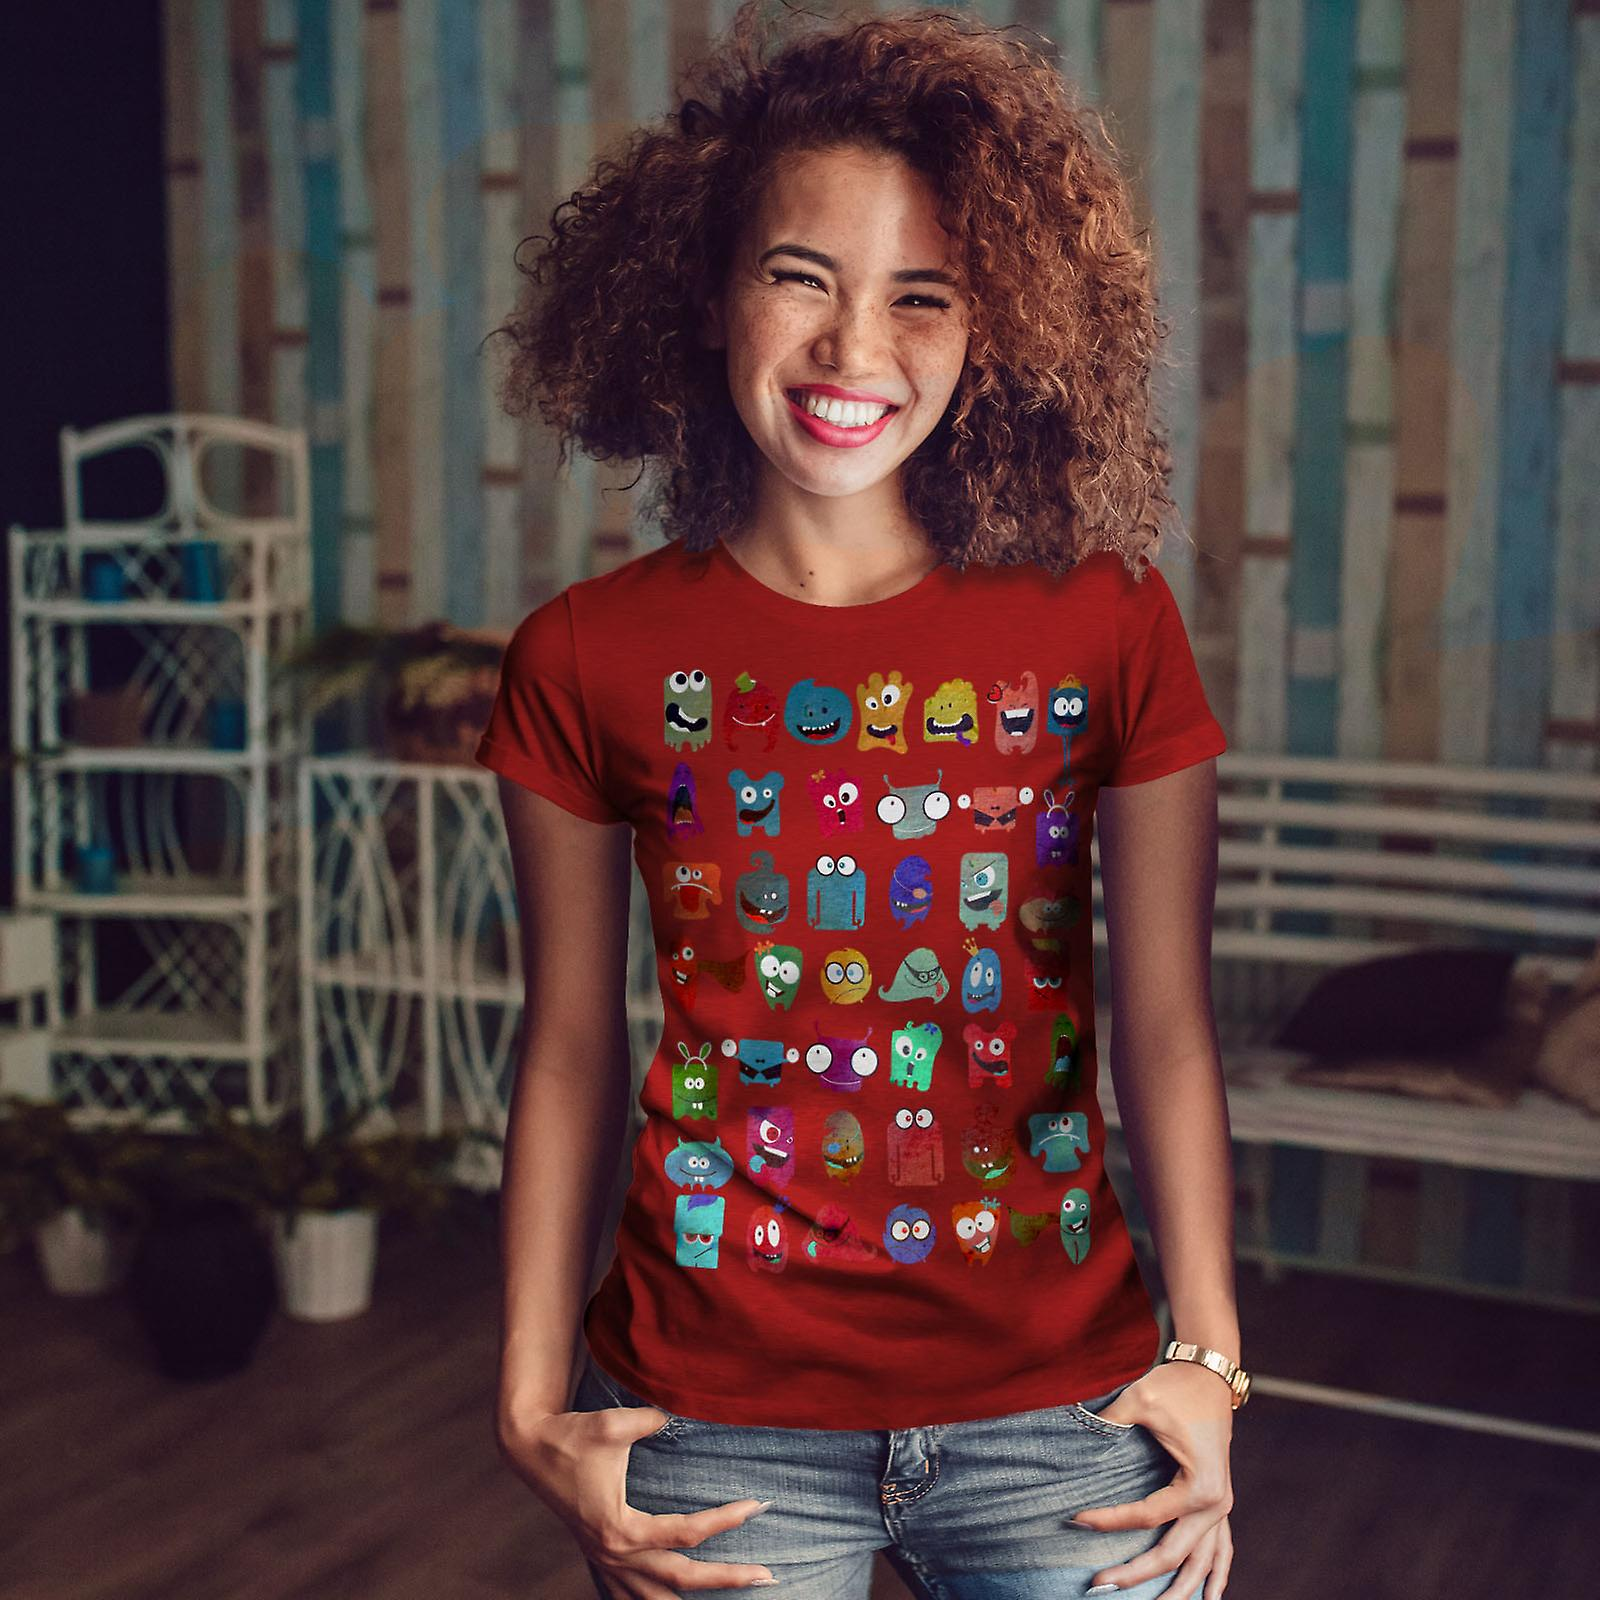 Femmes folles d'impression idiote RedT-chemise | Wellcoda